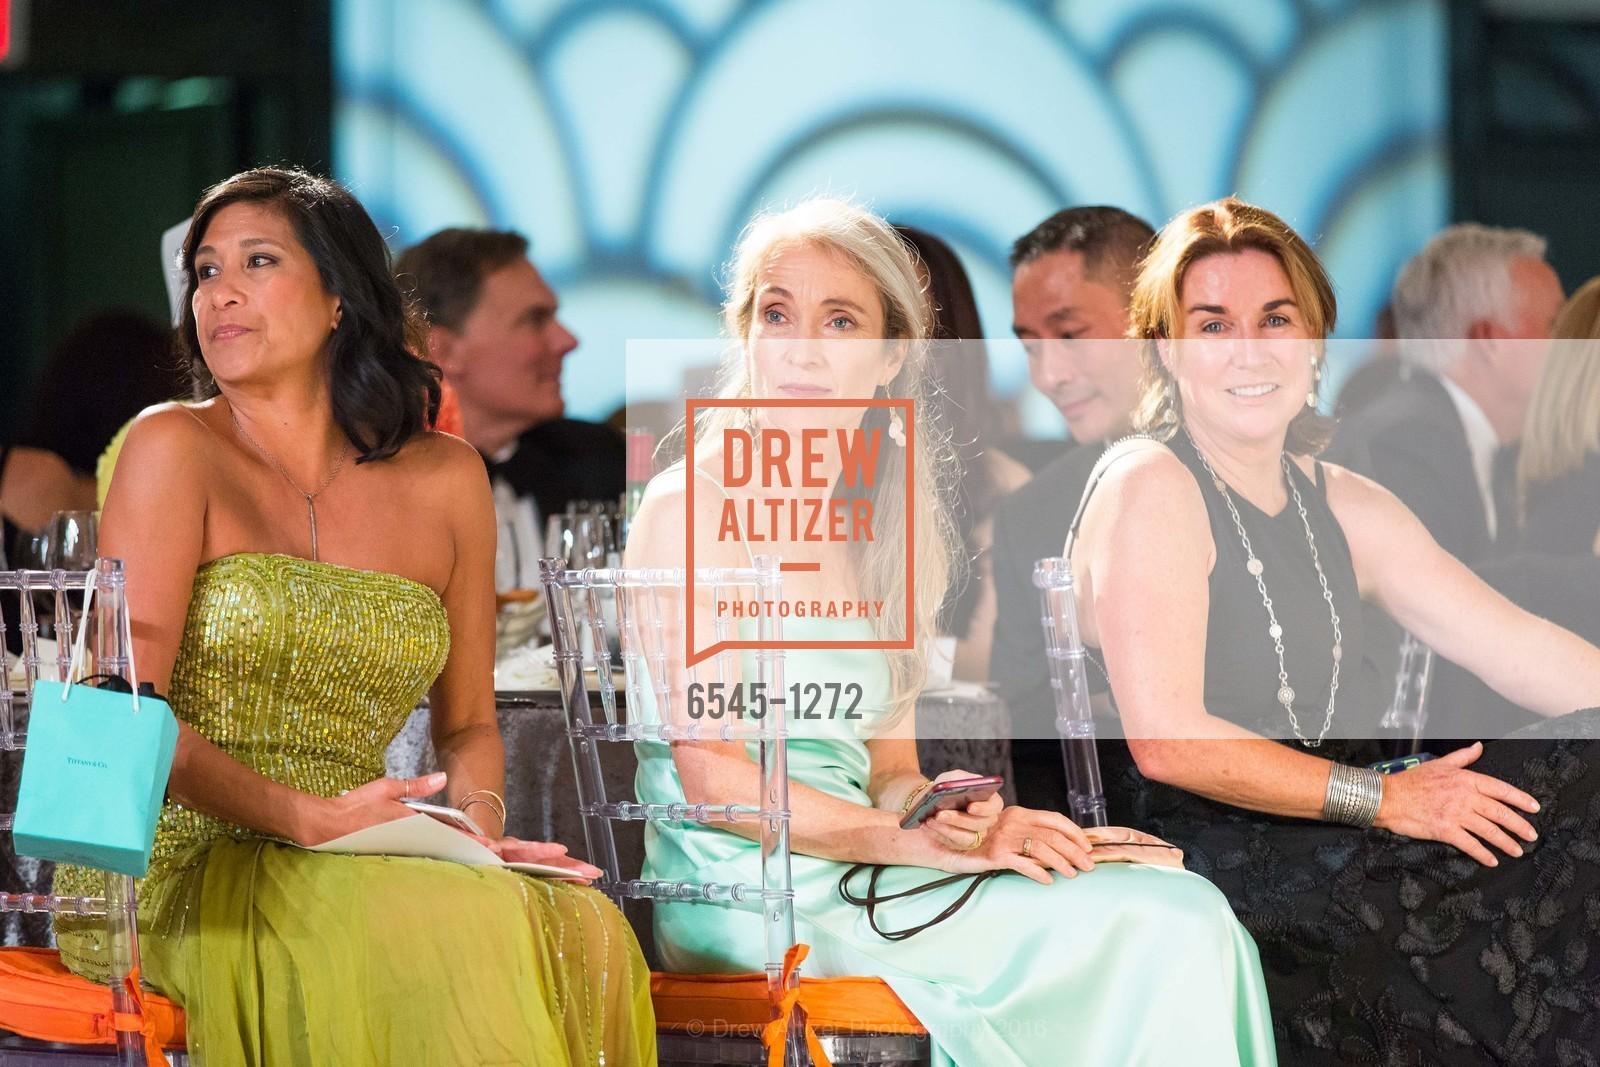 Cooksie Giannini, Caroline Hadfield, Kathleen Morrison, Photo #6545-1272